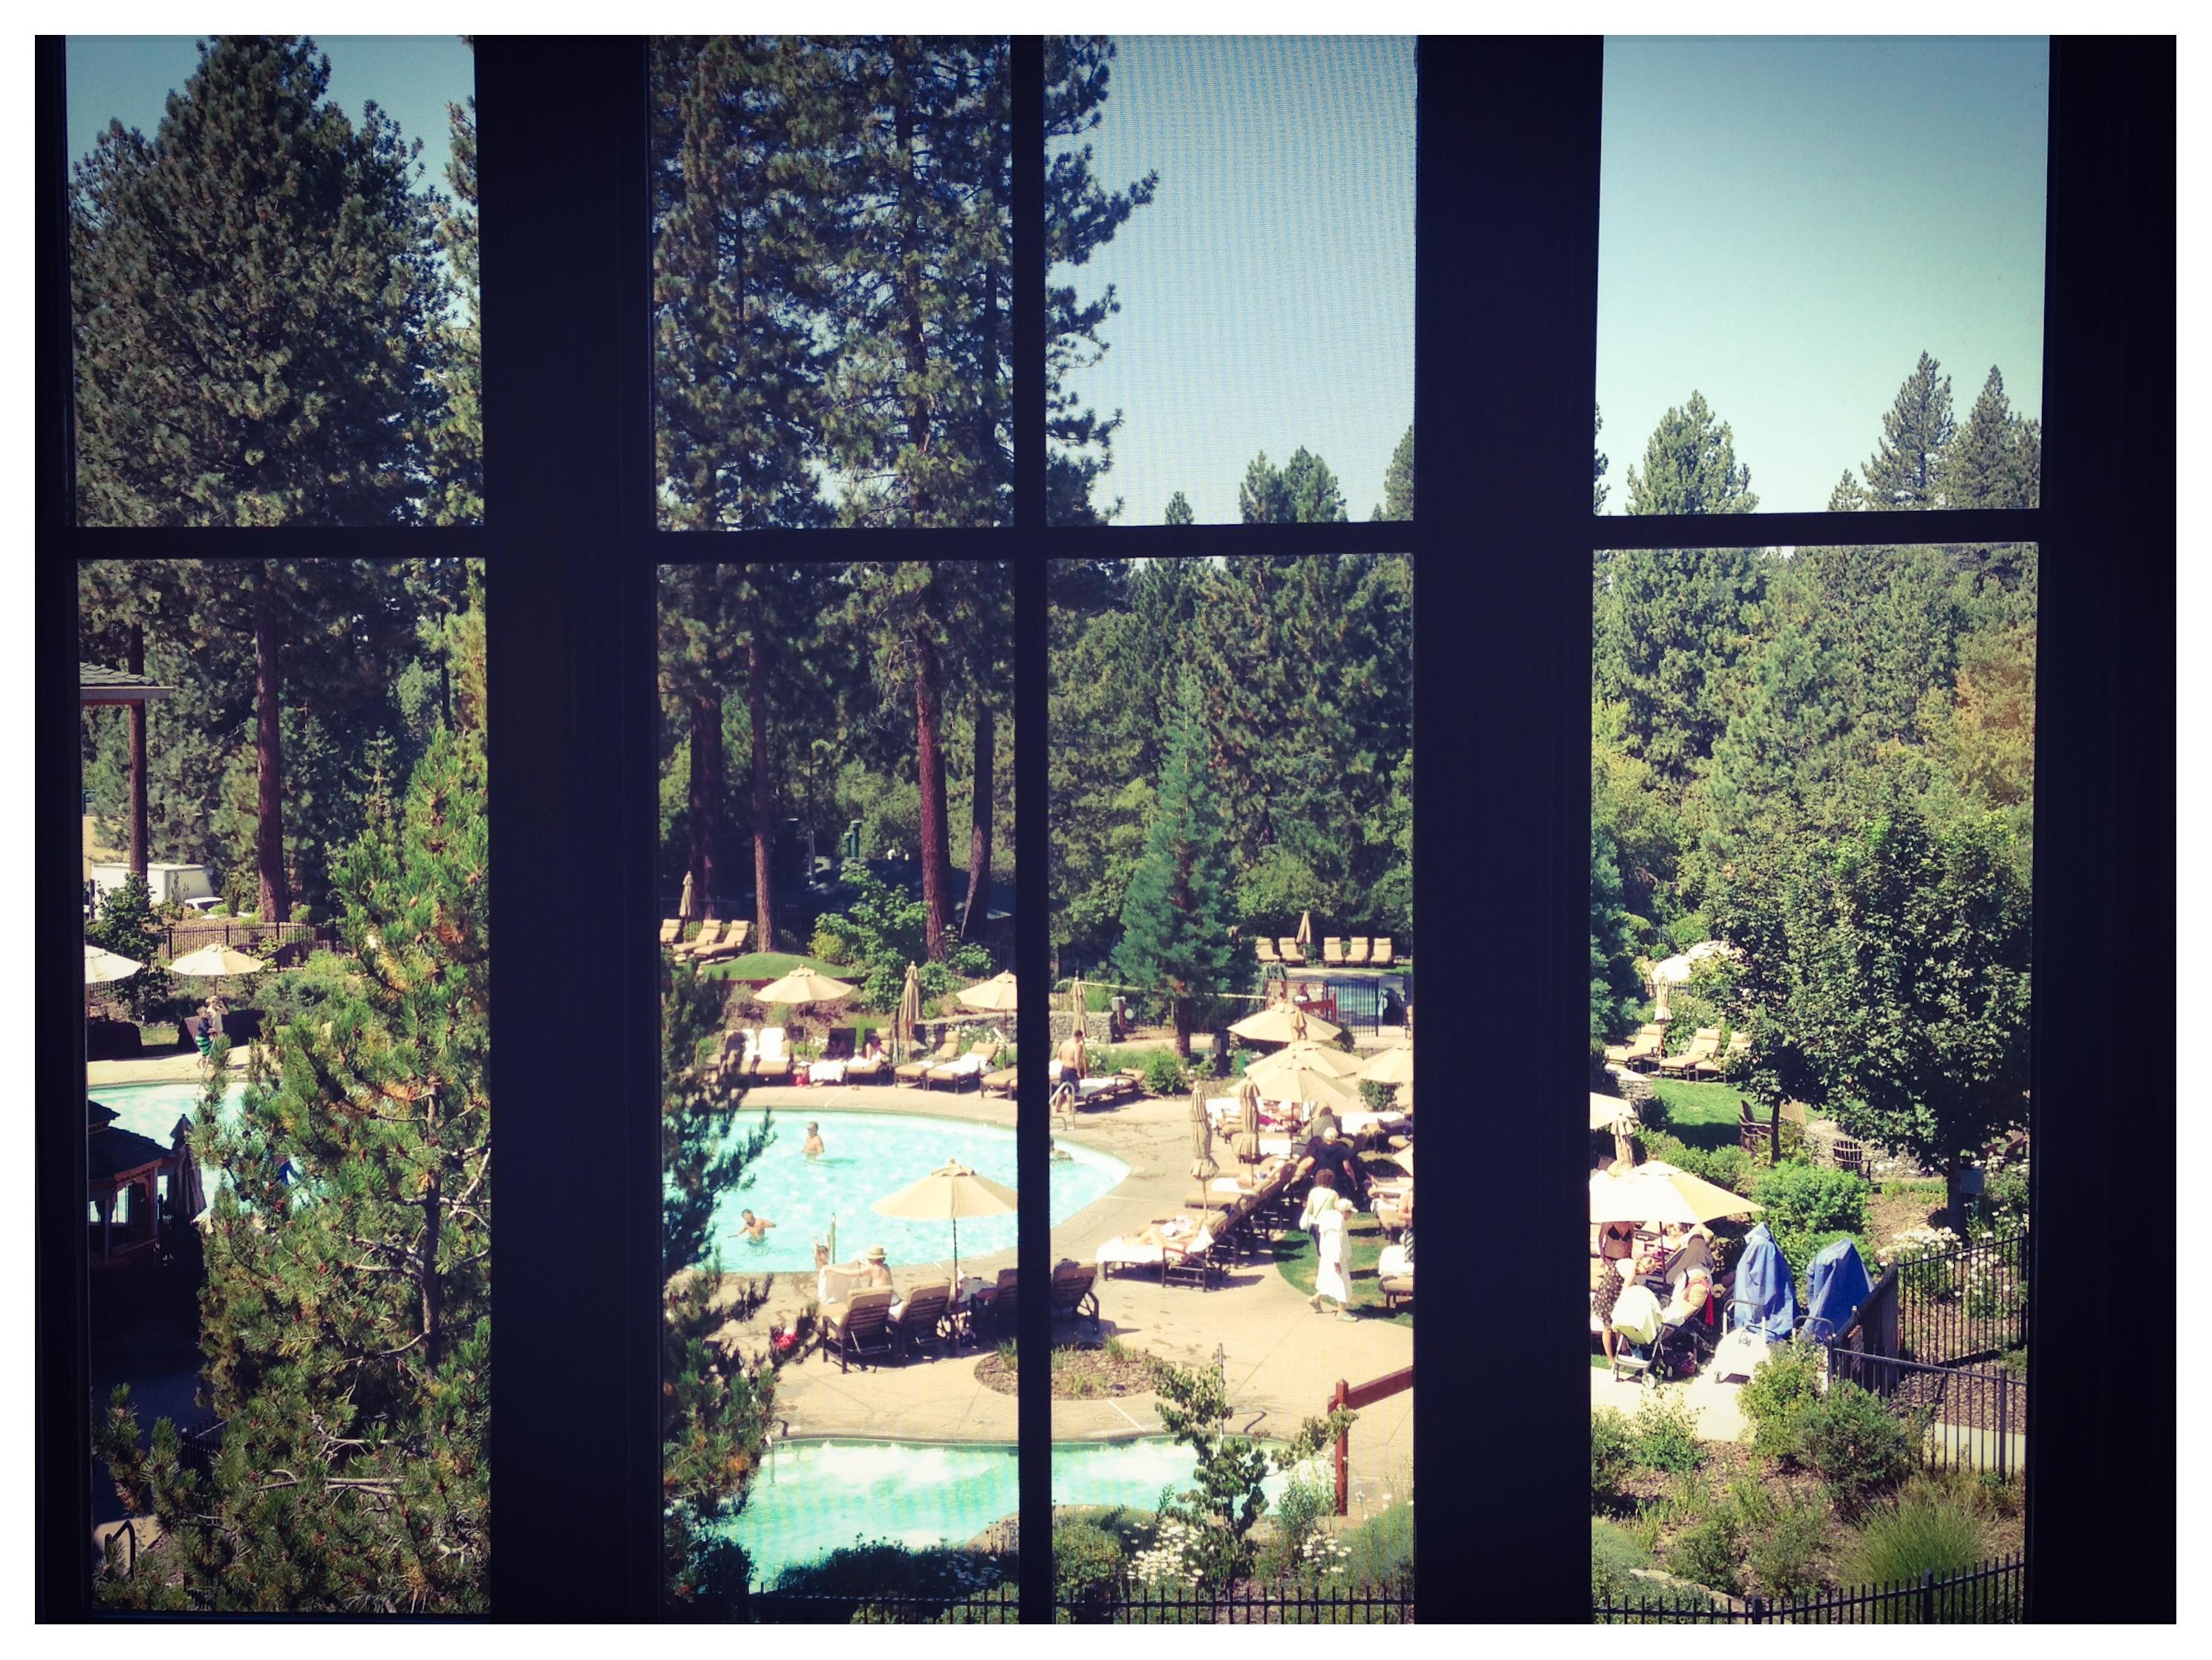 Hyatt Lake Tahoe, View from our Room